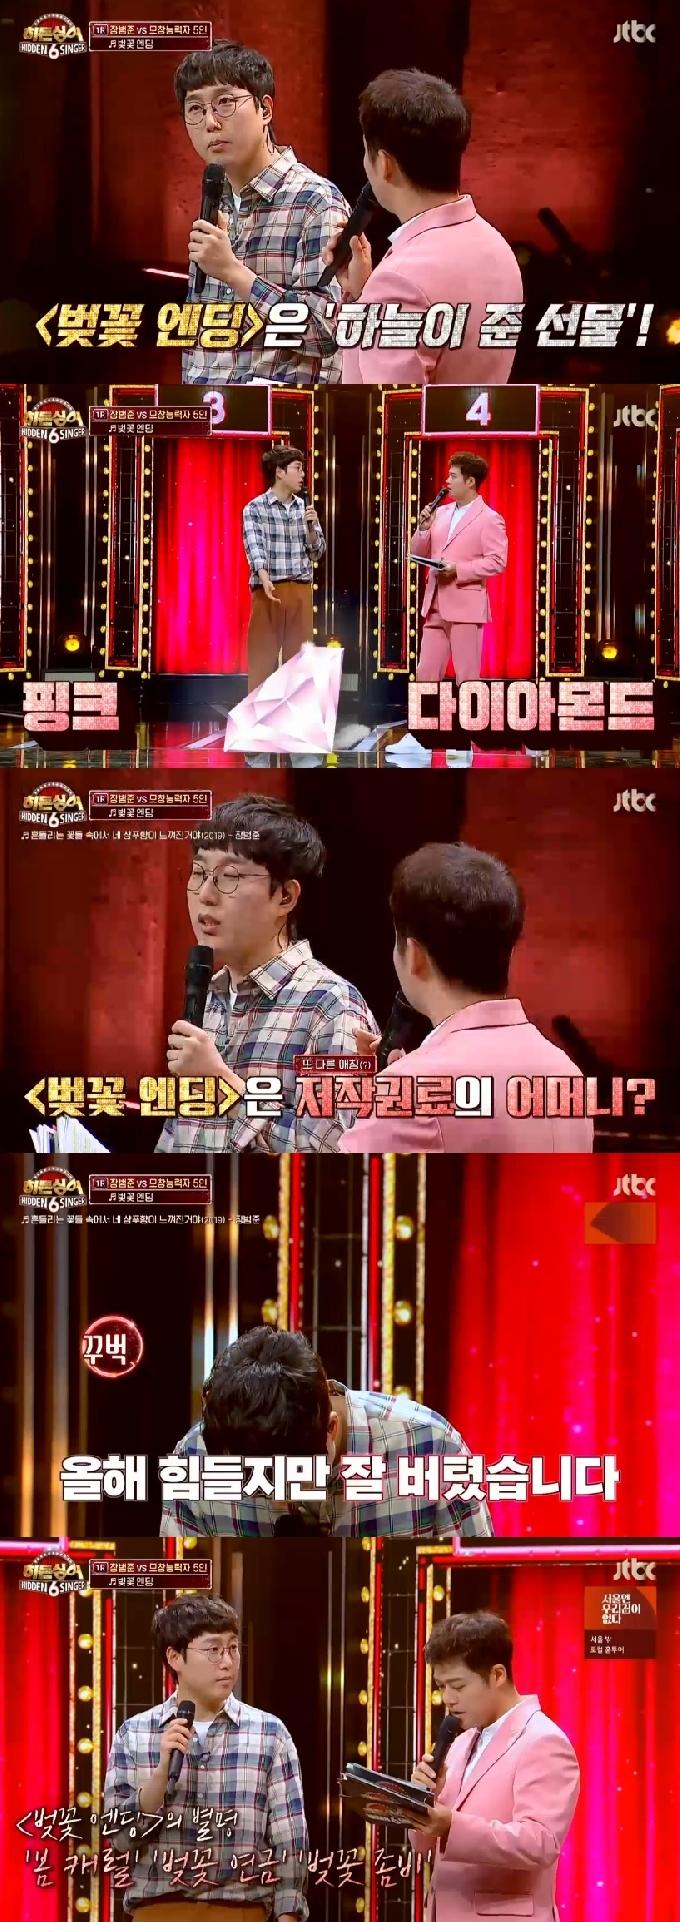 [RE:TV] '히든싱어6' 장범준